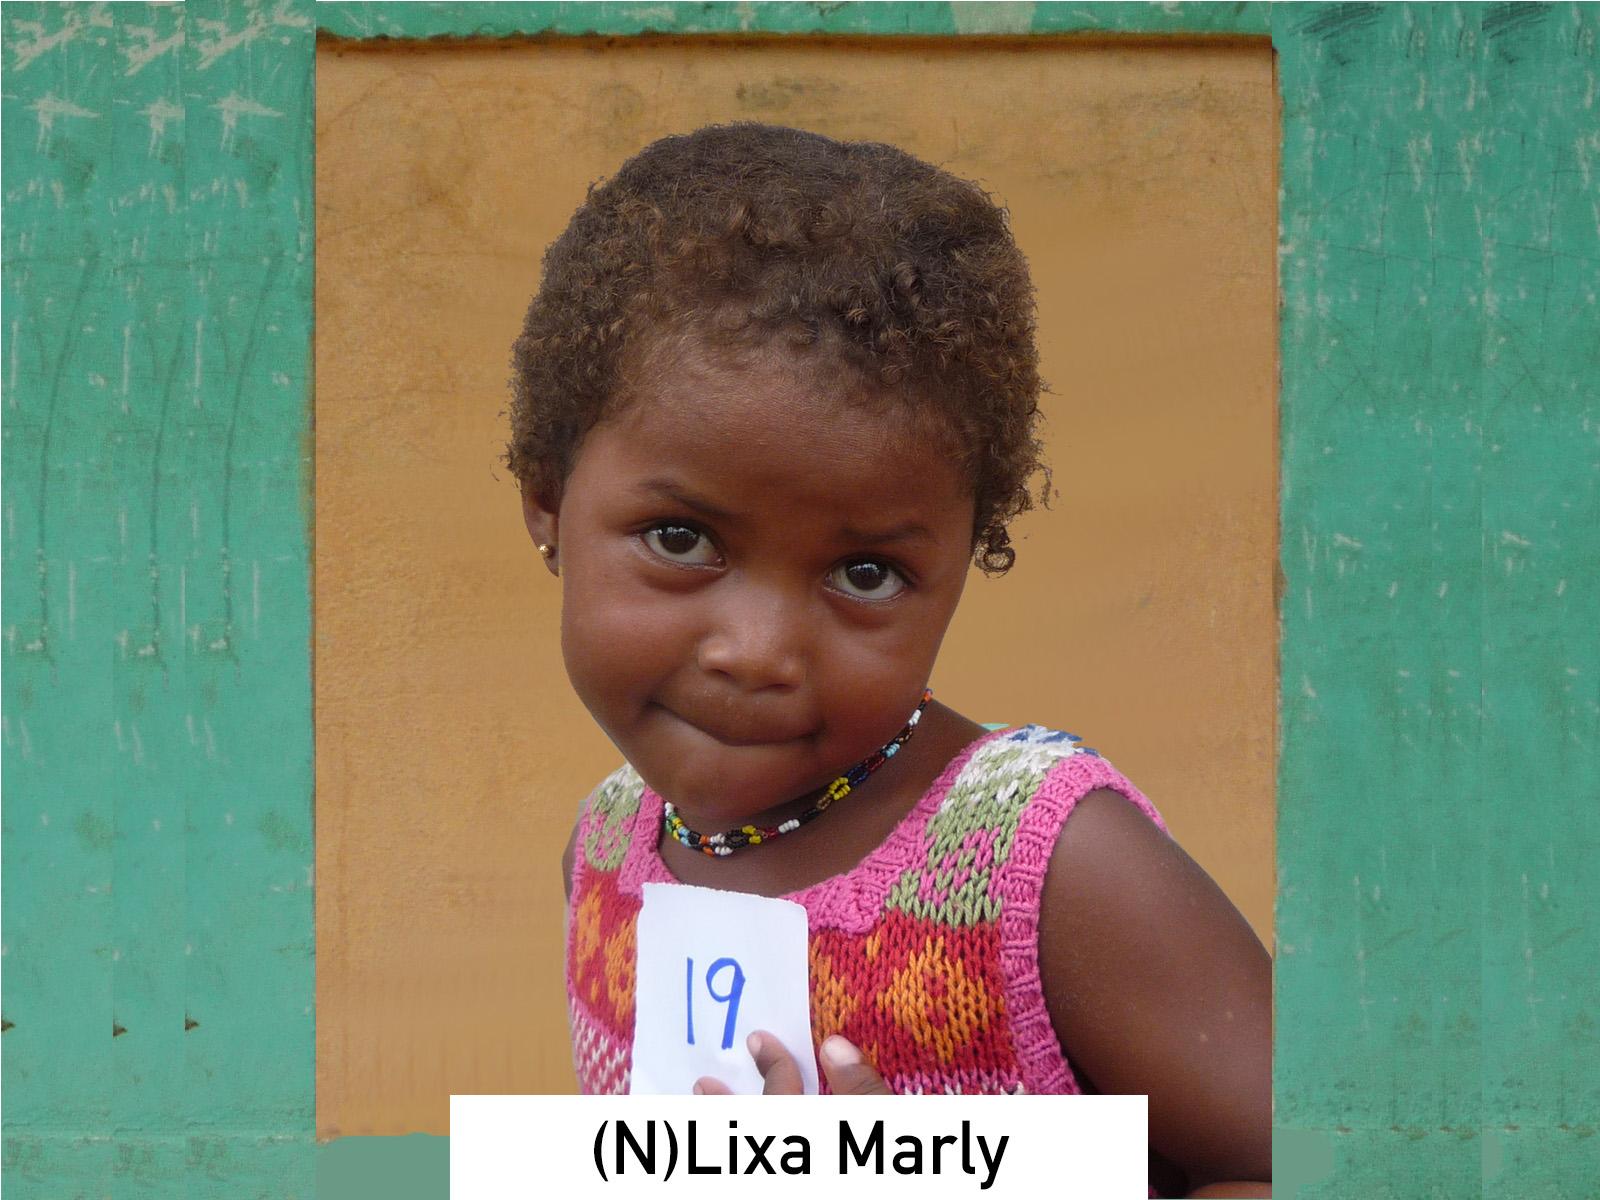 019 - (N)Lixa Marly.jpg